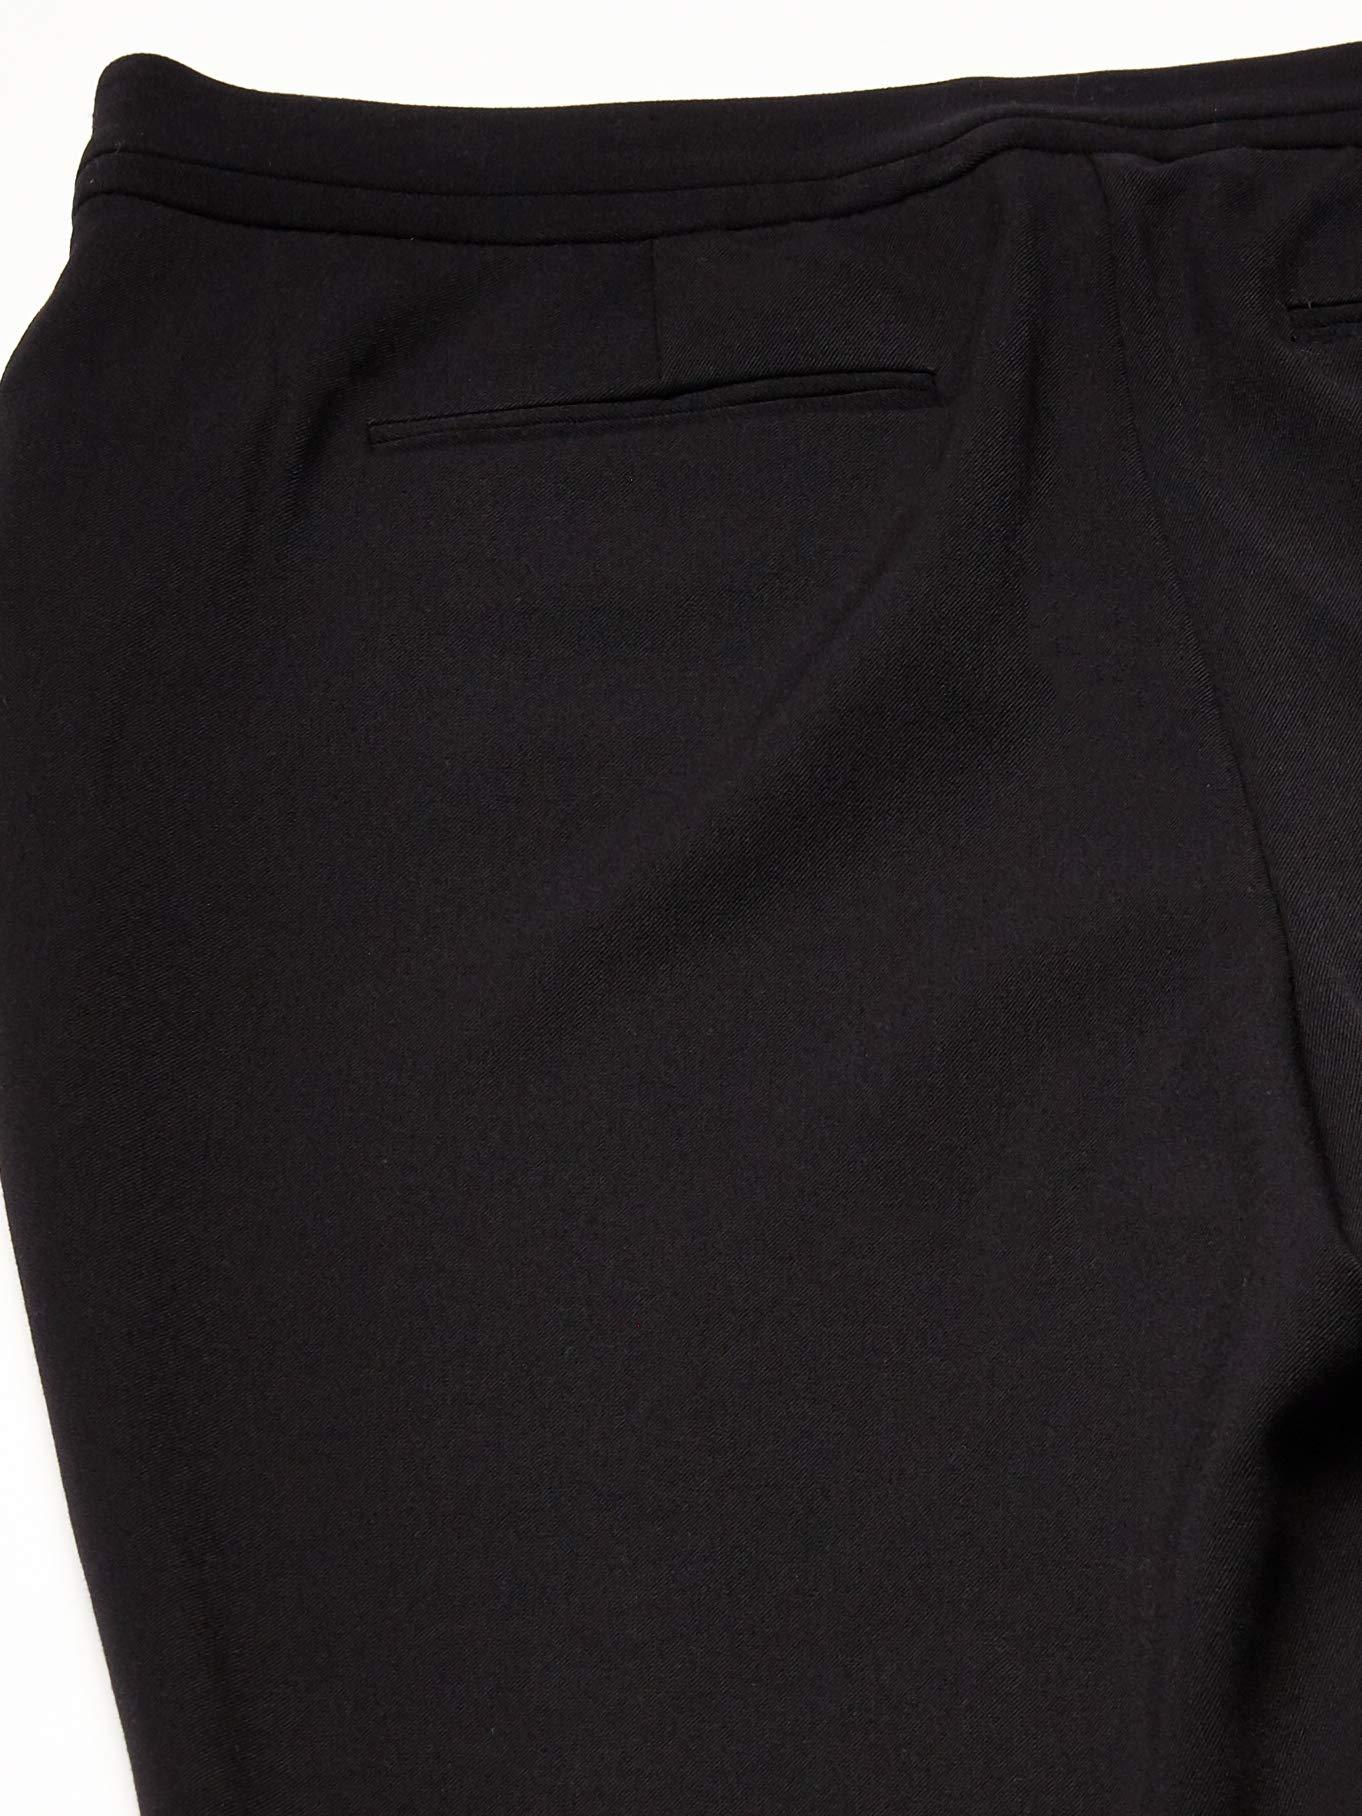 Rafaella Women's Curvy Fit Gabardine Slim Leg Pant